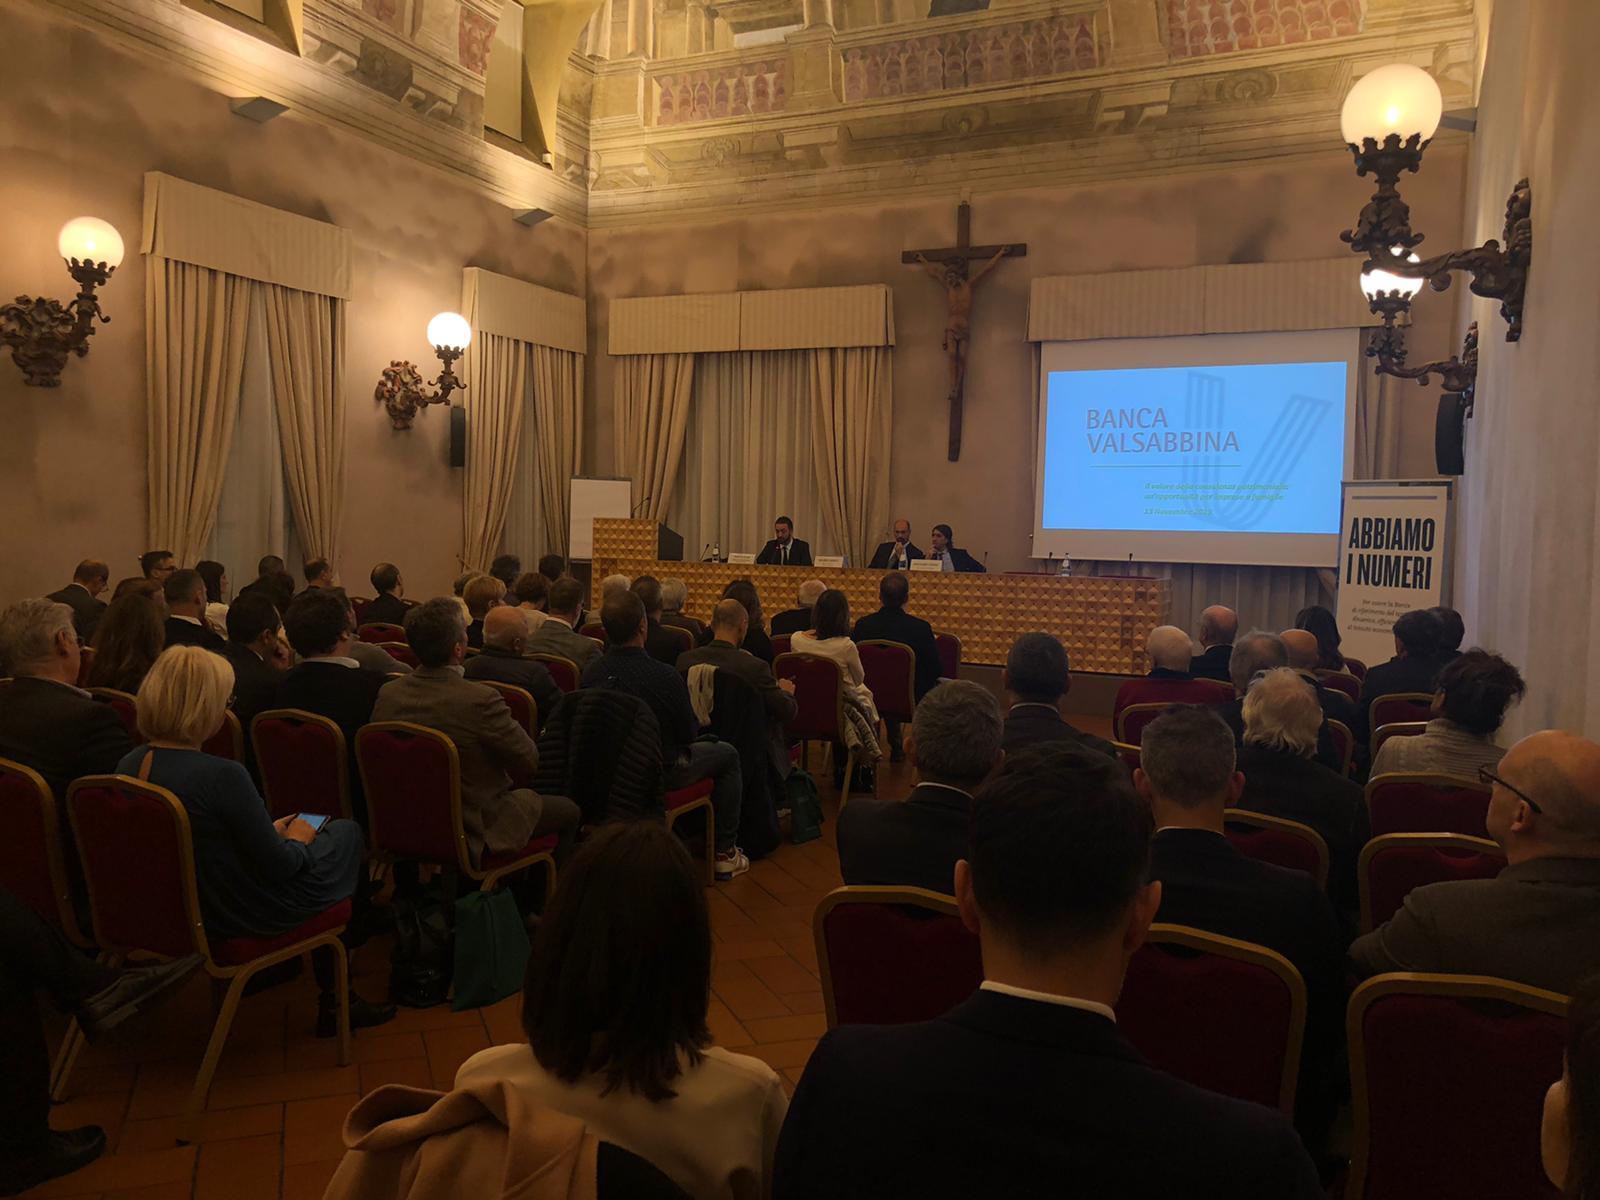 evento gestione patrimoniale 20191113   Banca Valsabbina